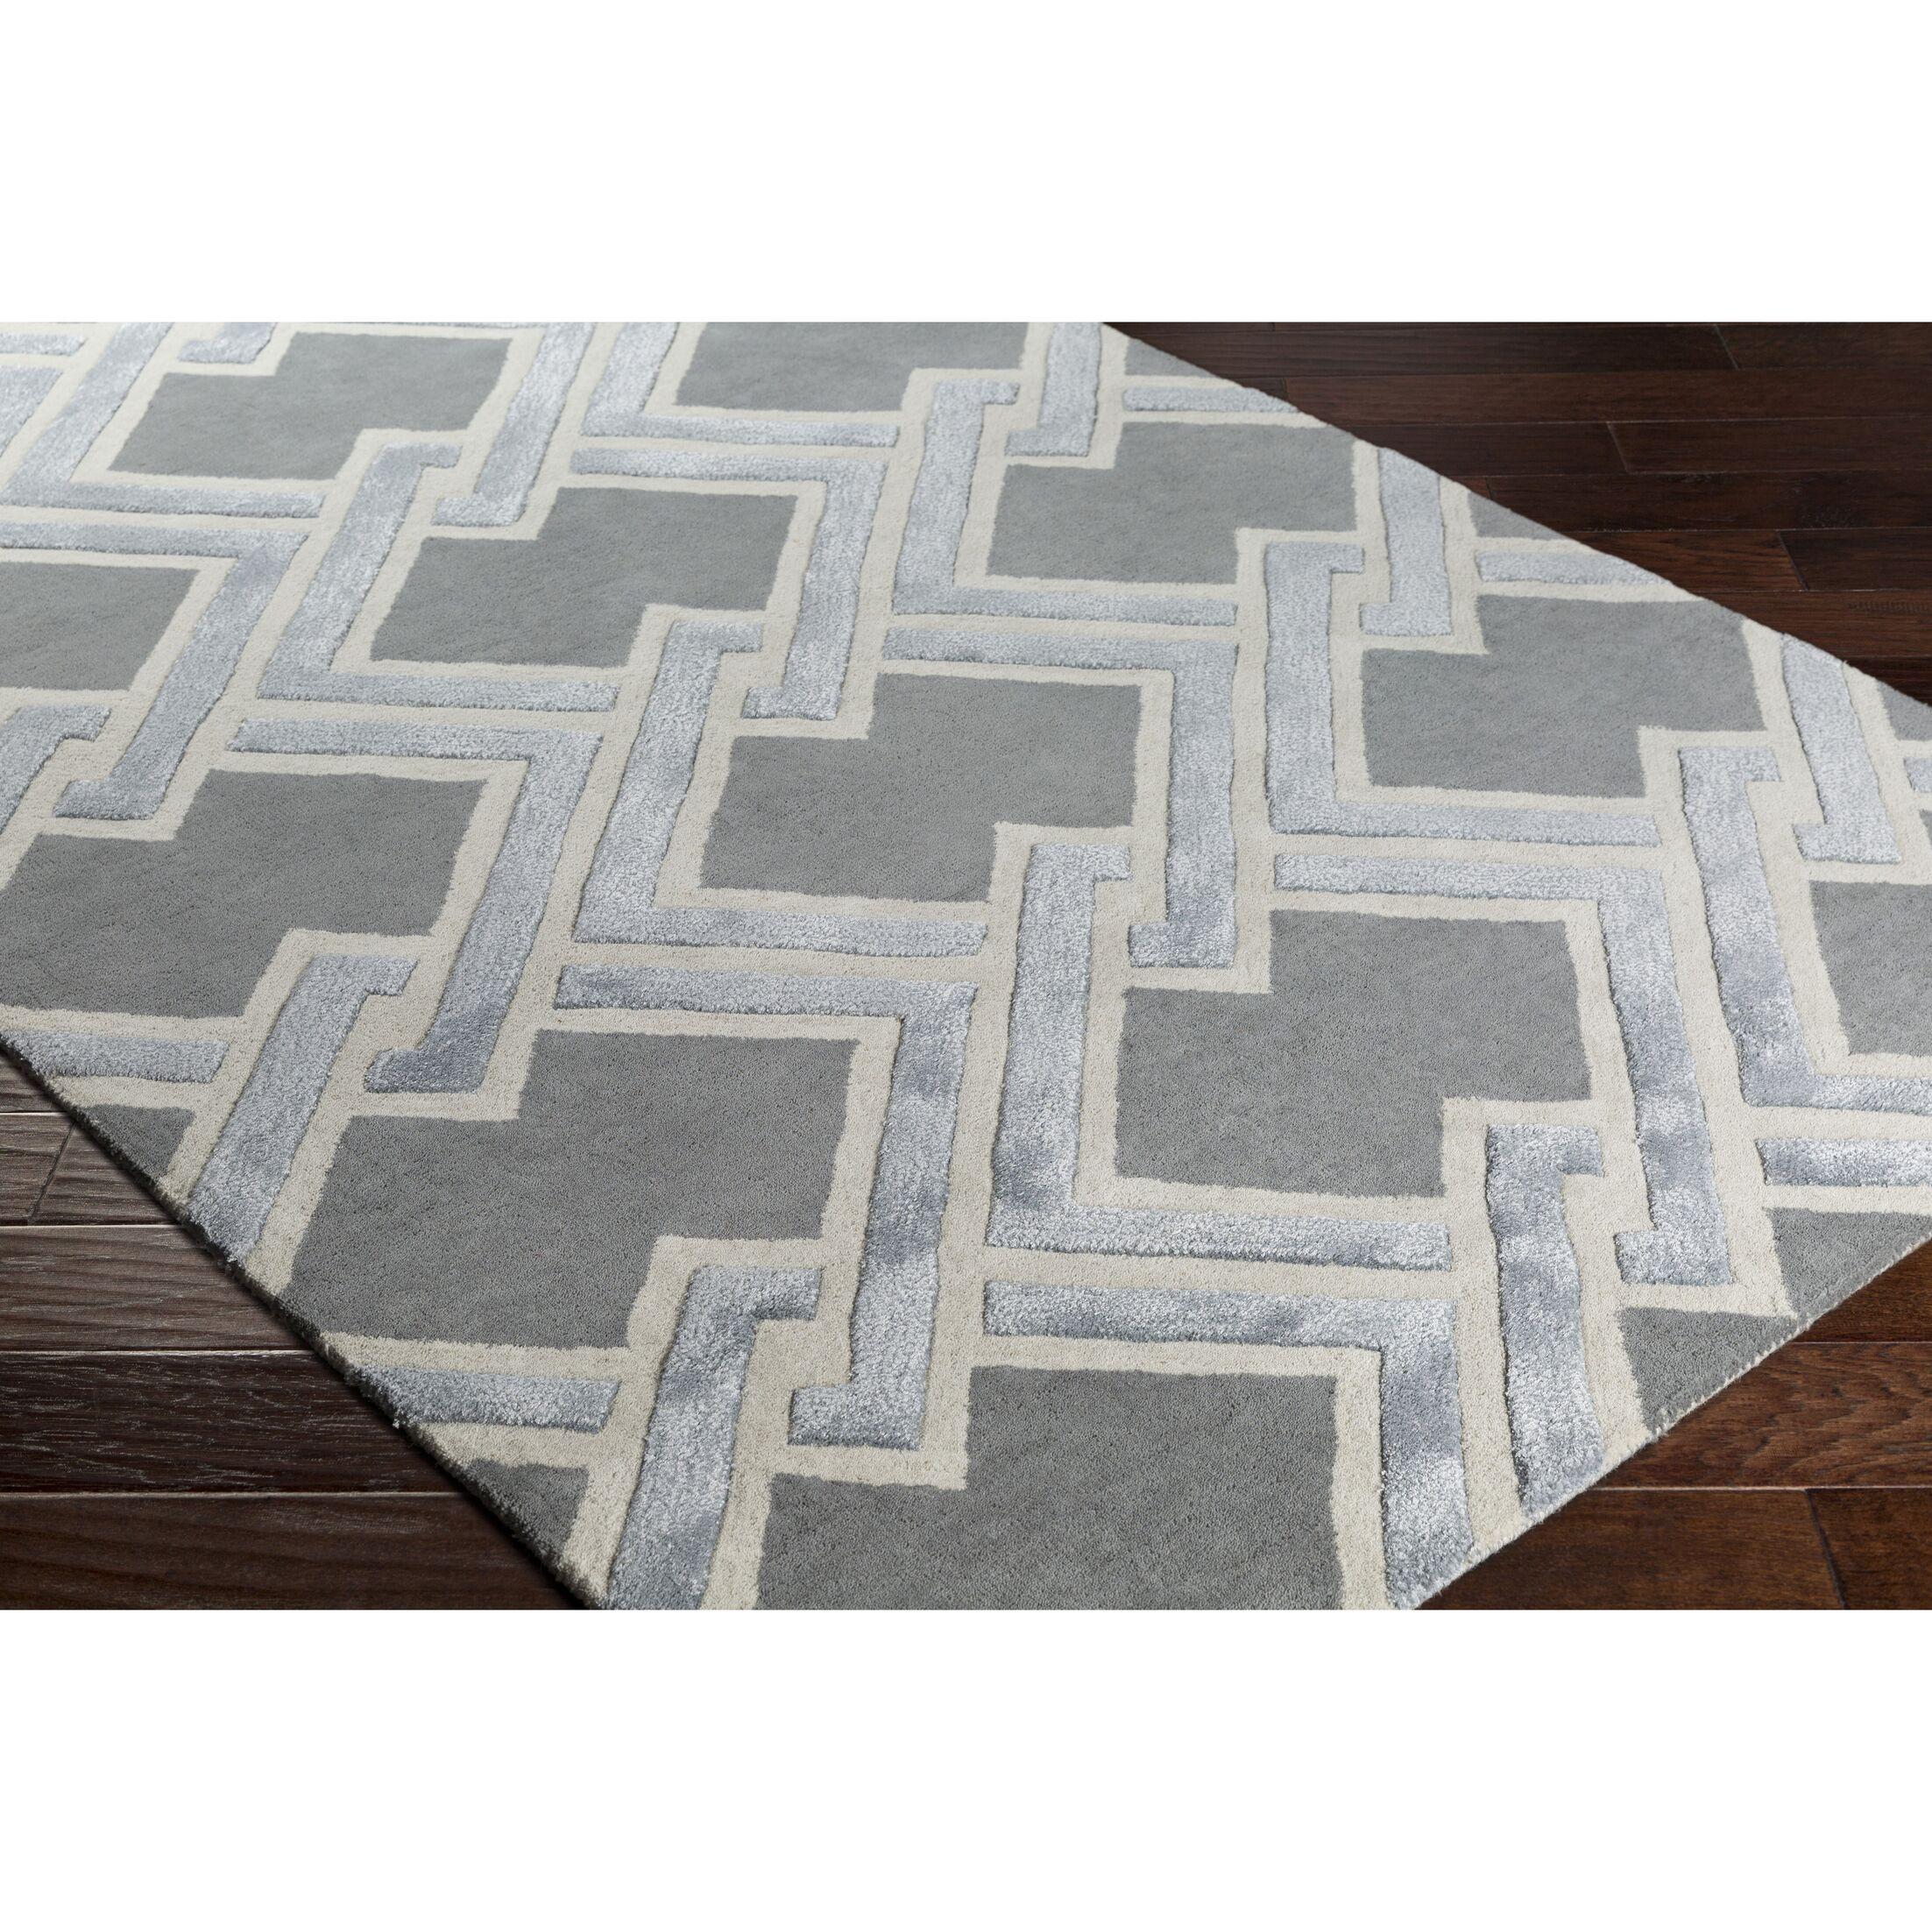 Vazquez Hand-Tufted Gray Area Rug Rug Size: Rectangle 5' x 7'6